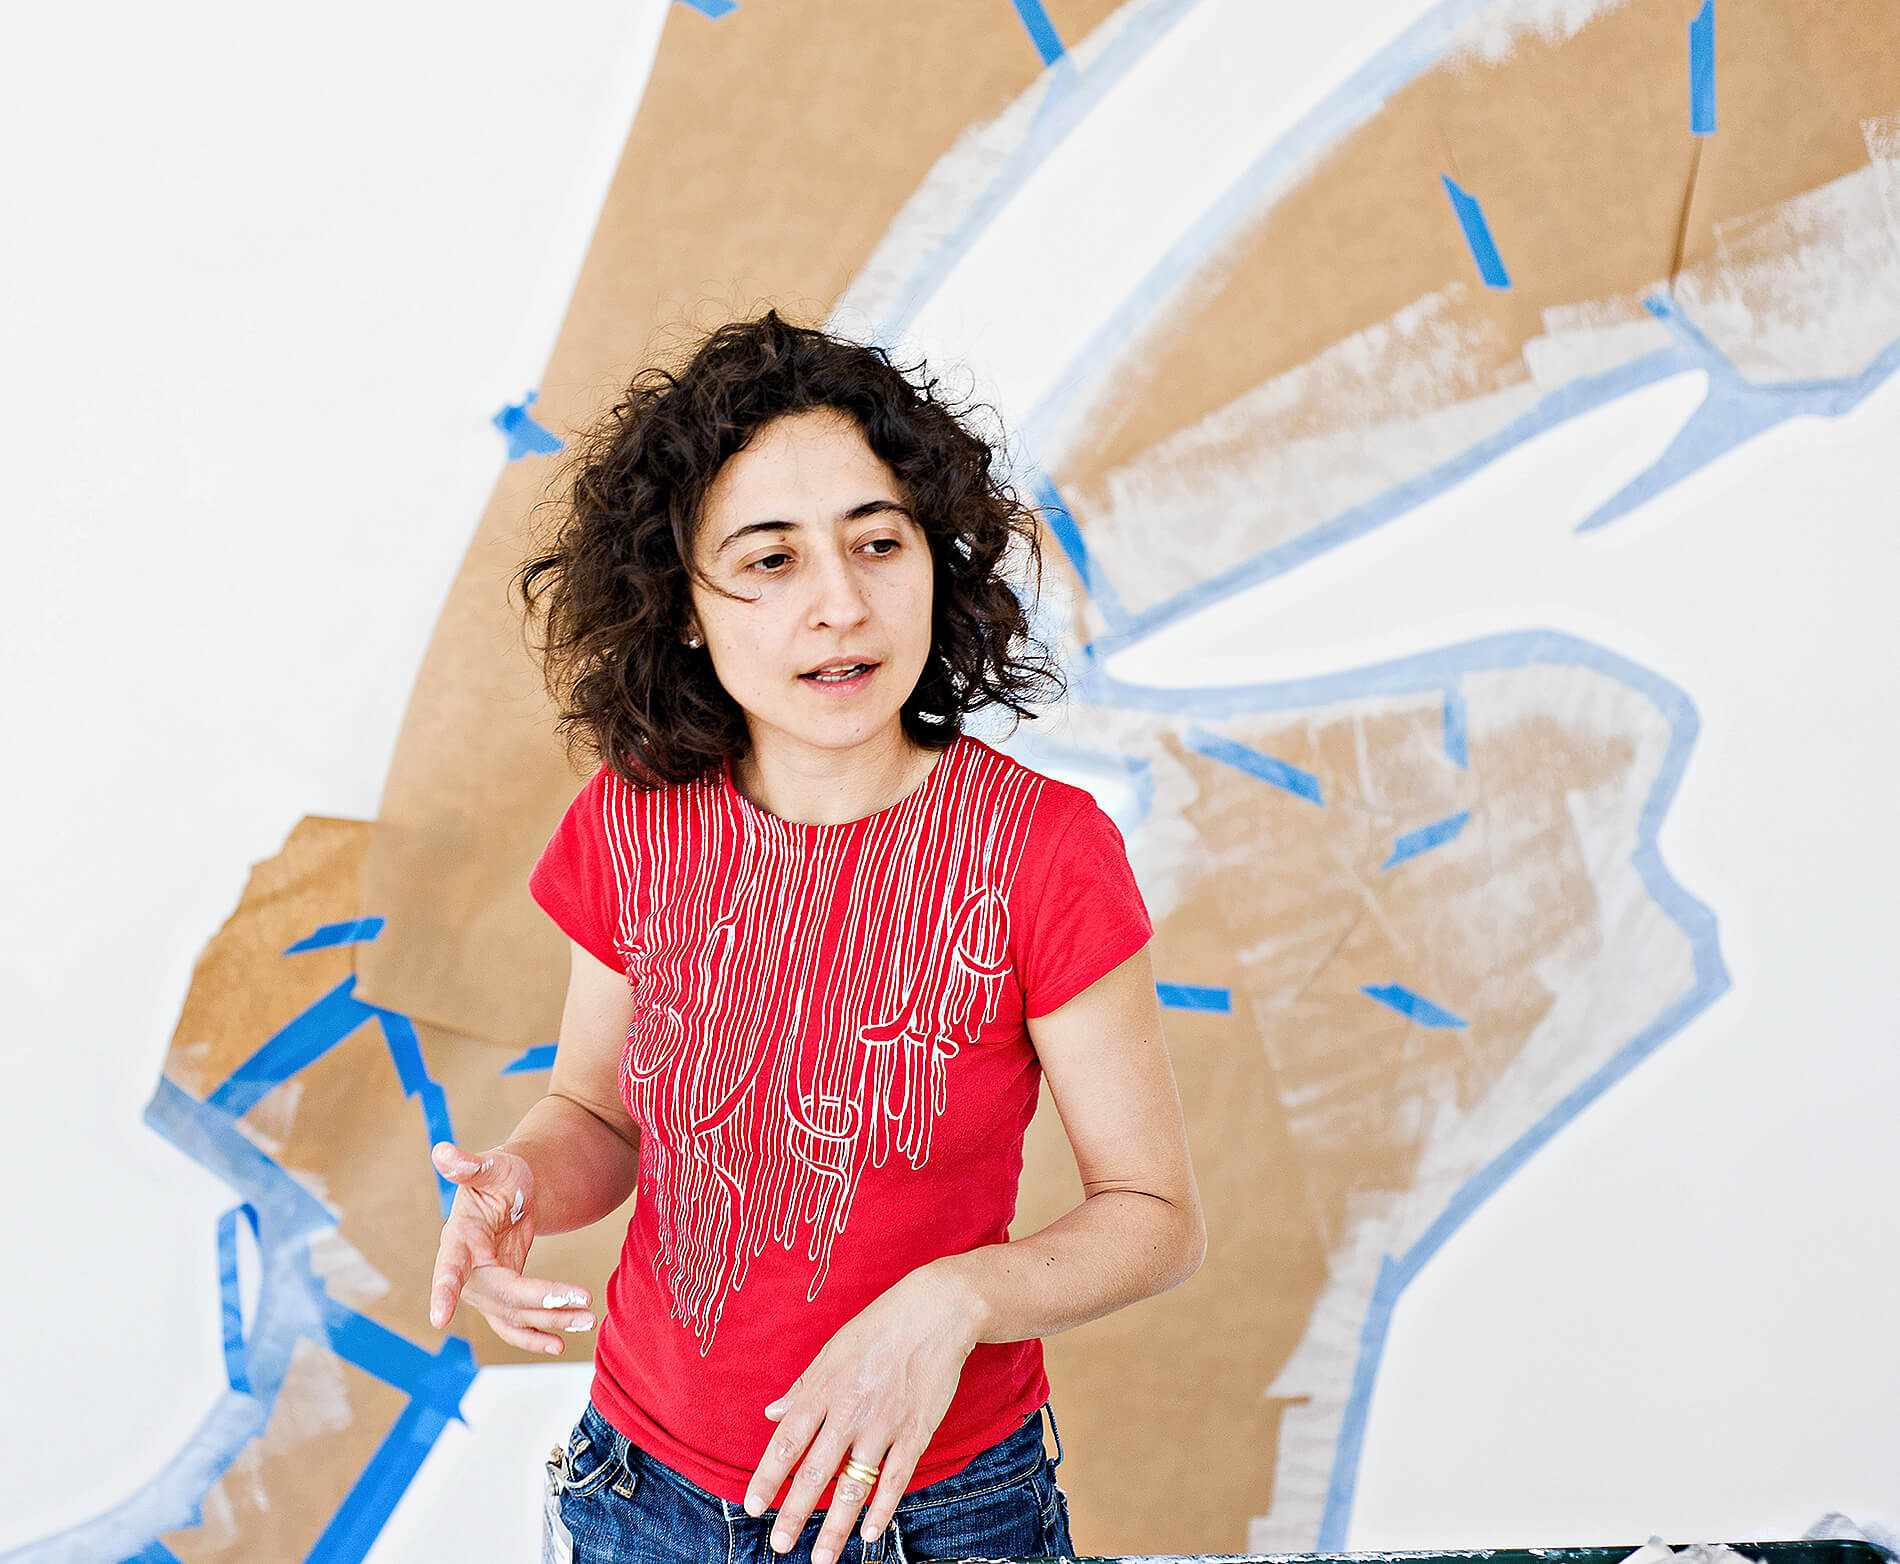 Artist Rosana Castrillo Diaz